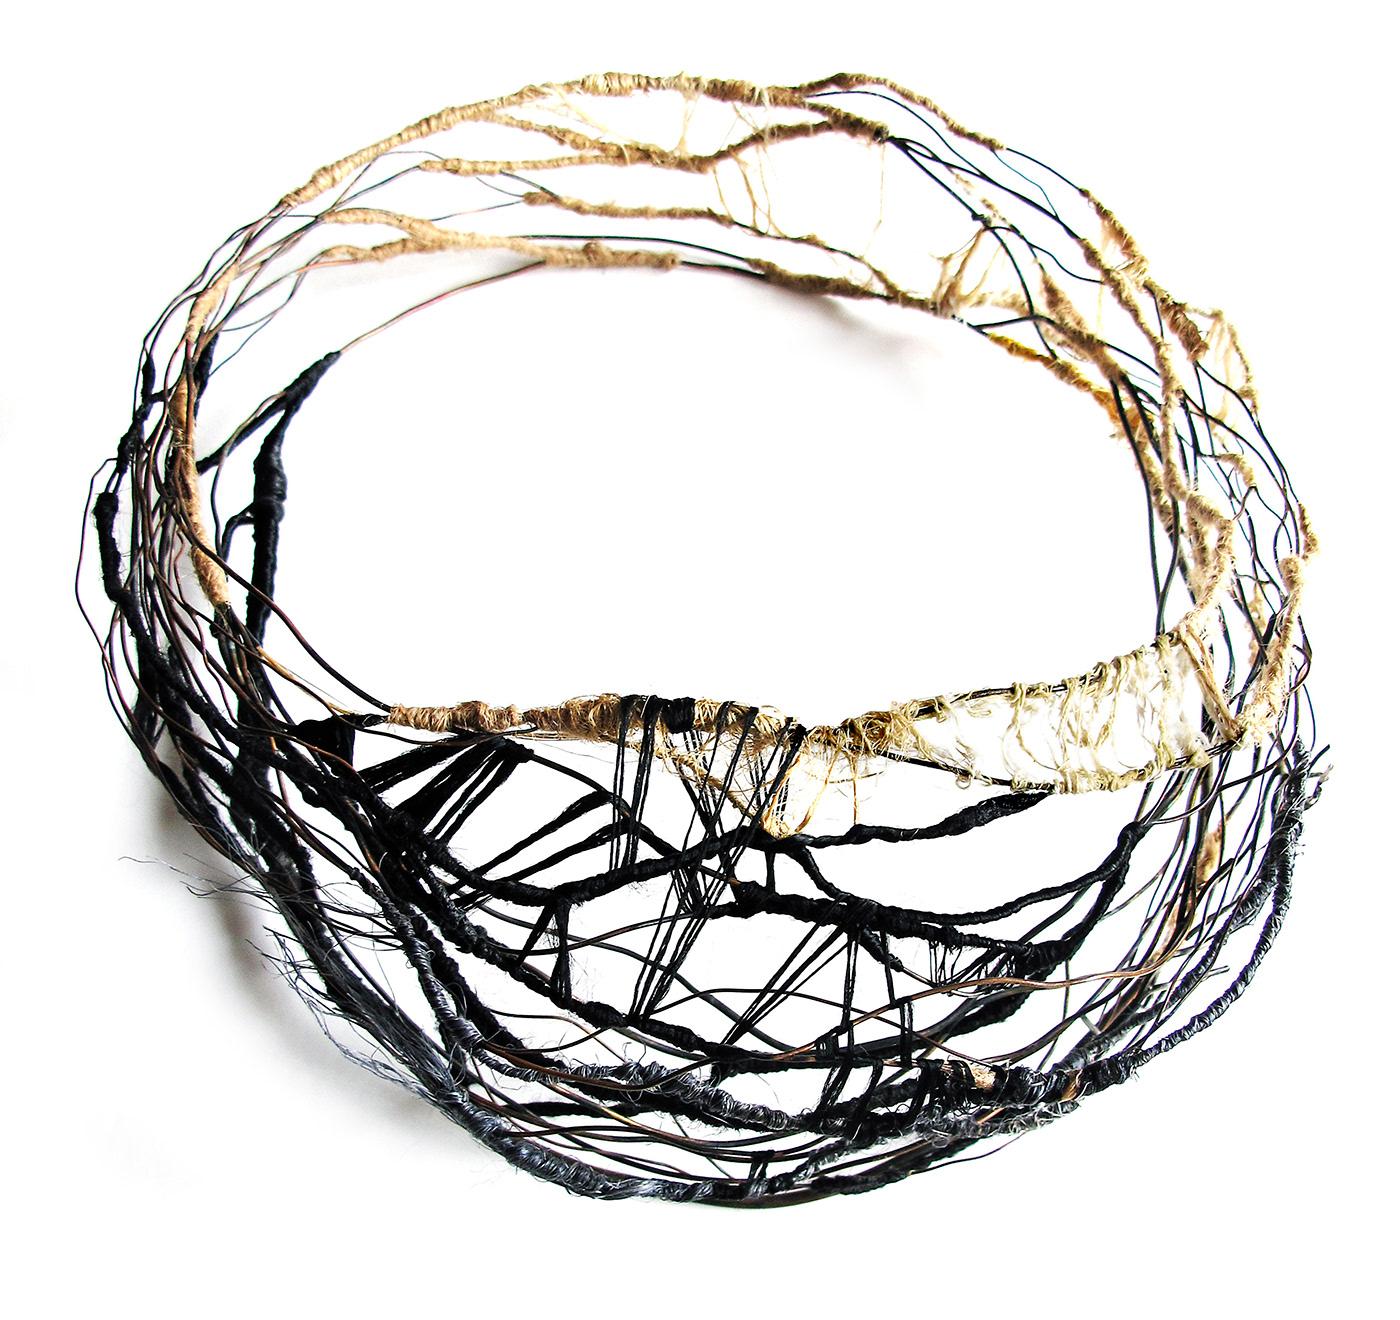 bracelet contemporary jewelery  contemporary jewelry earings joyeria Joyería contemporánea mabel pena Nature Necklace